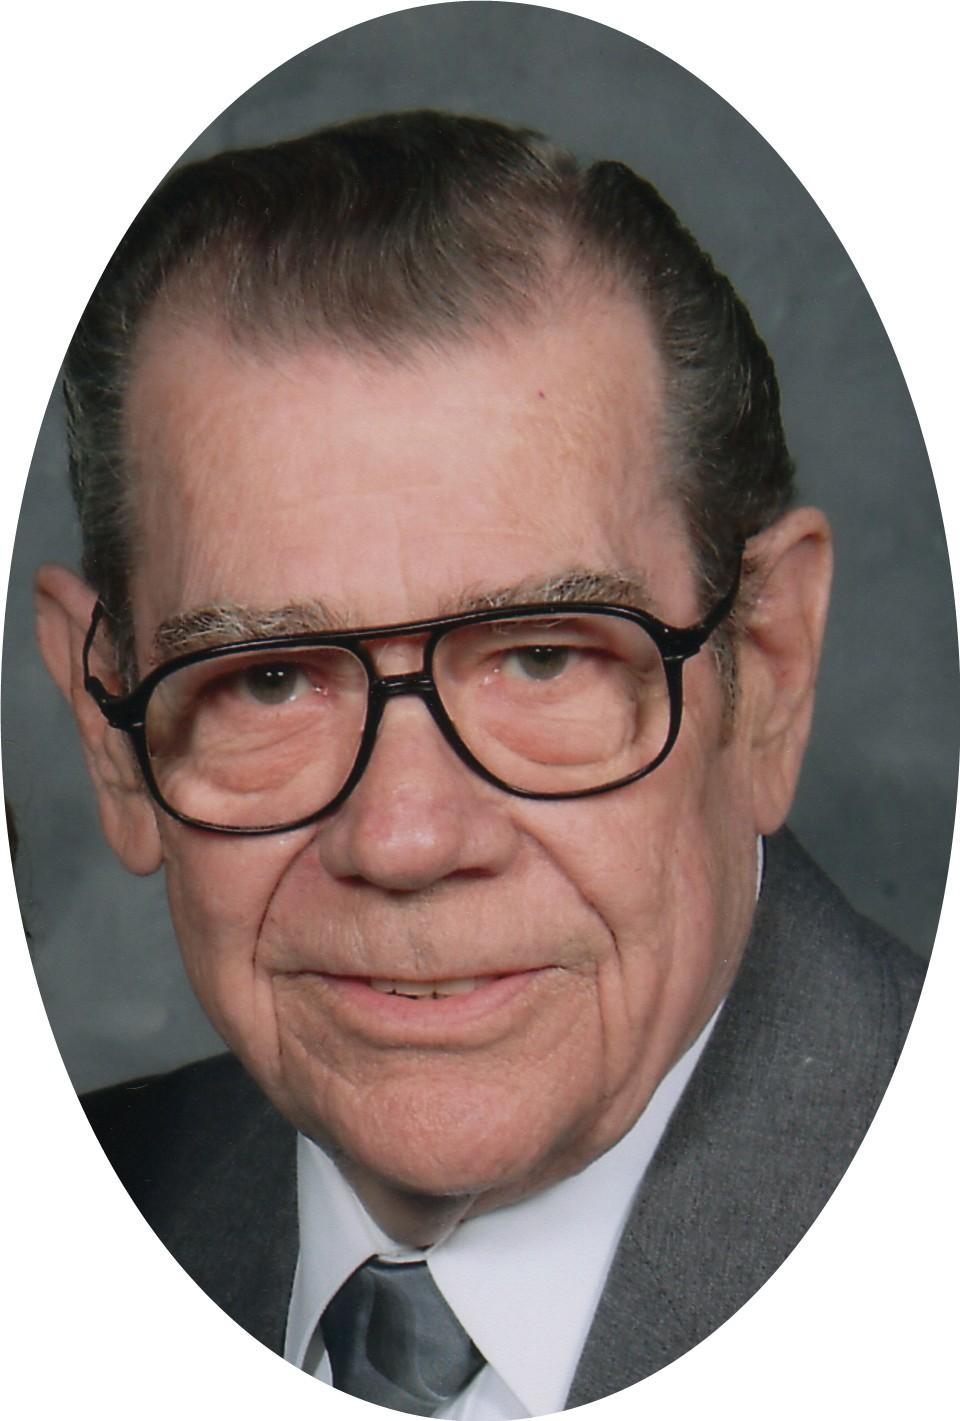 Frank C. Calhoun